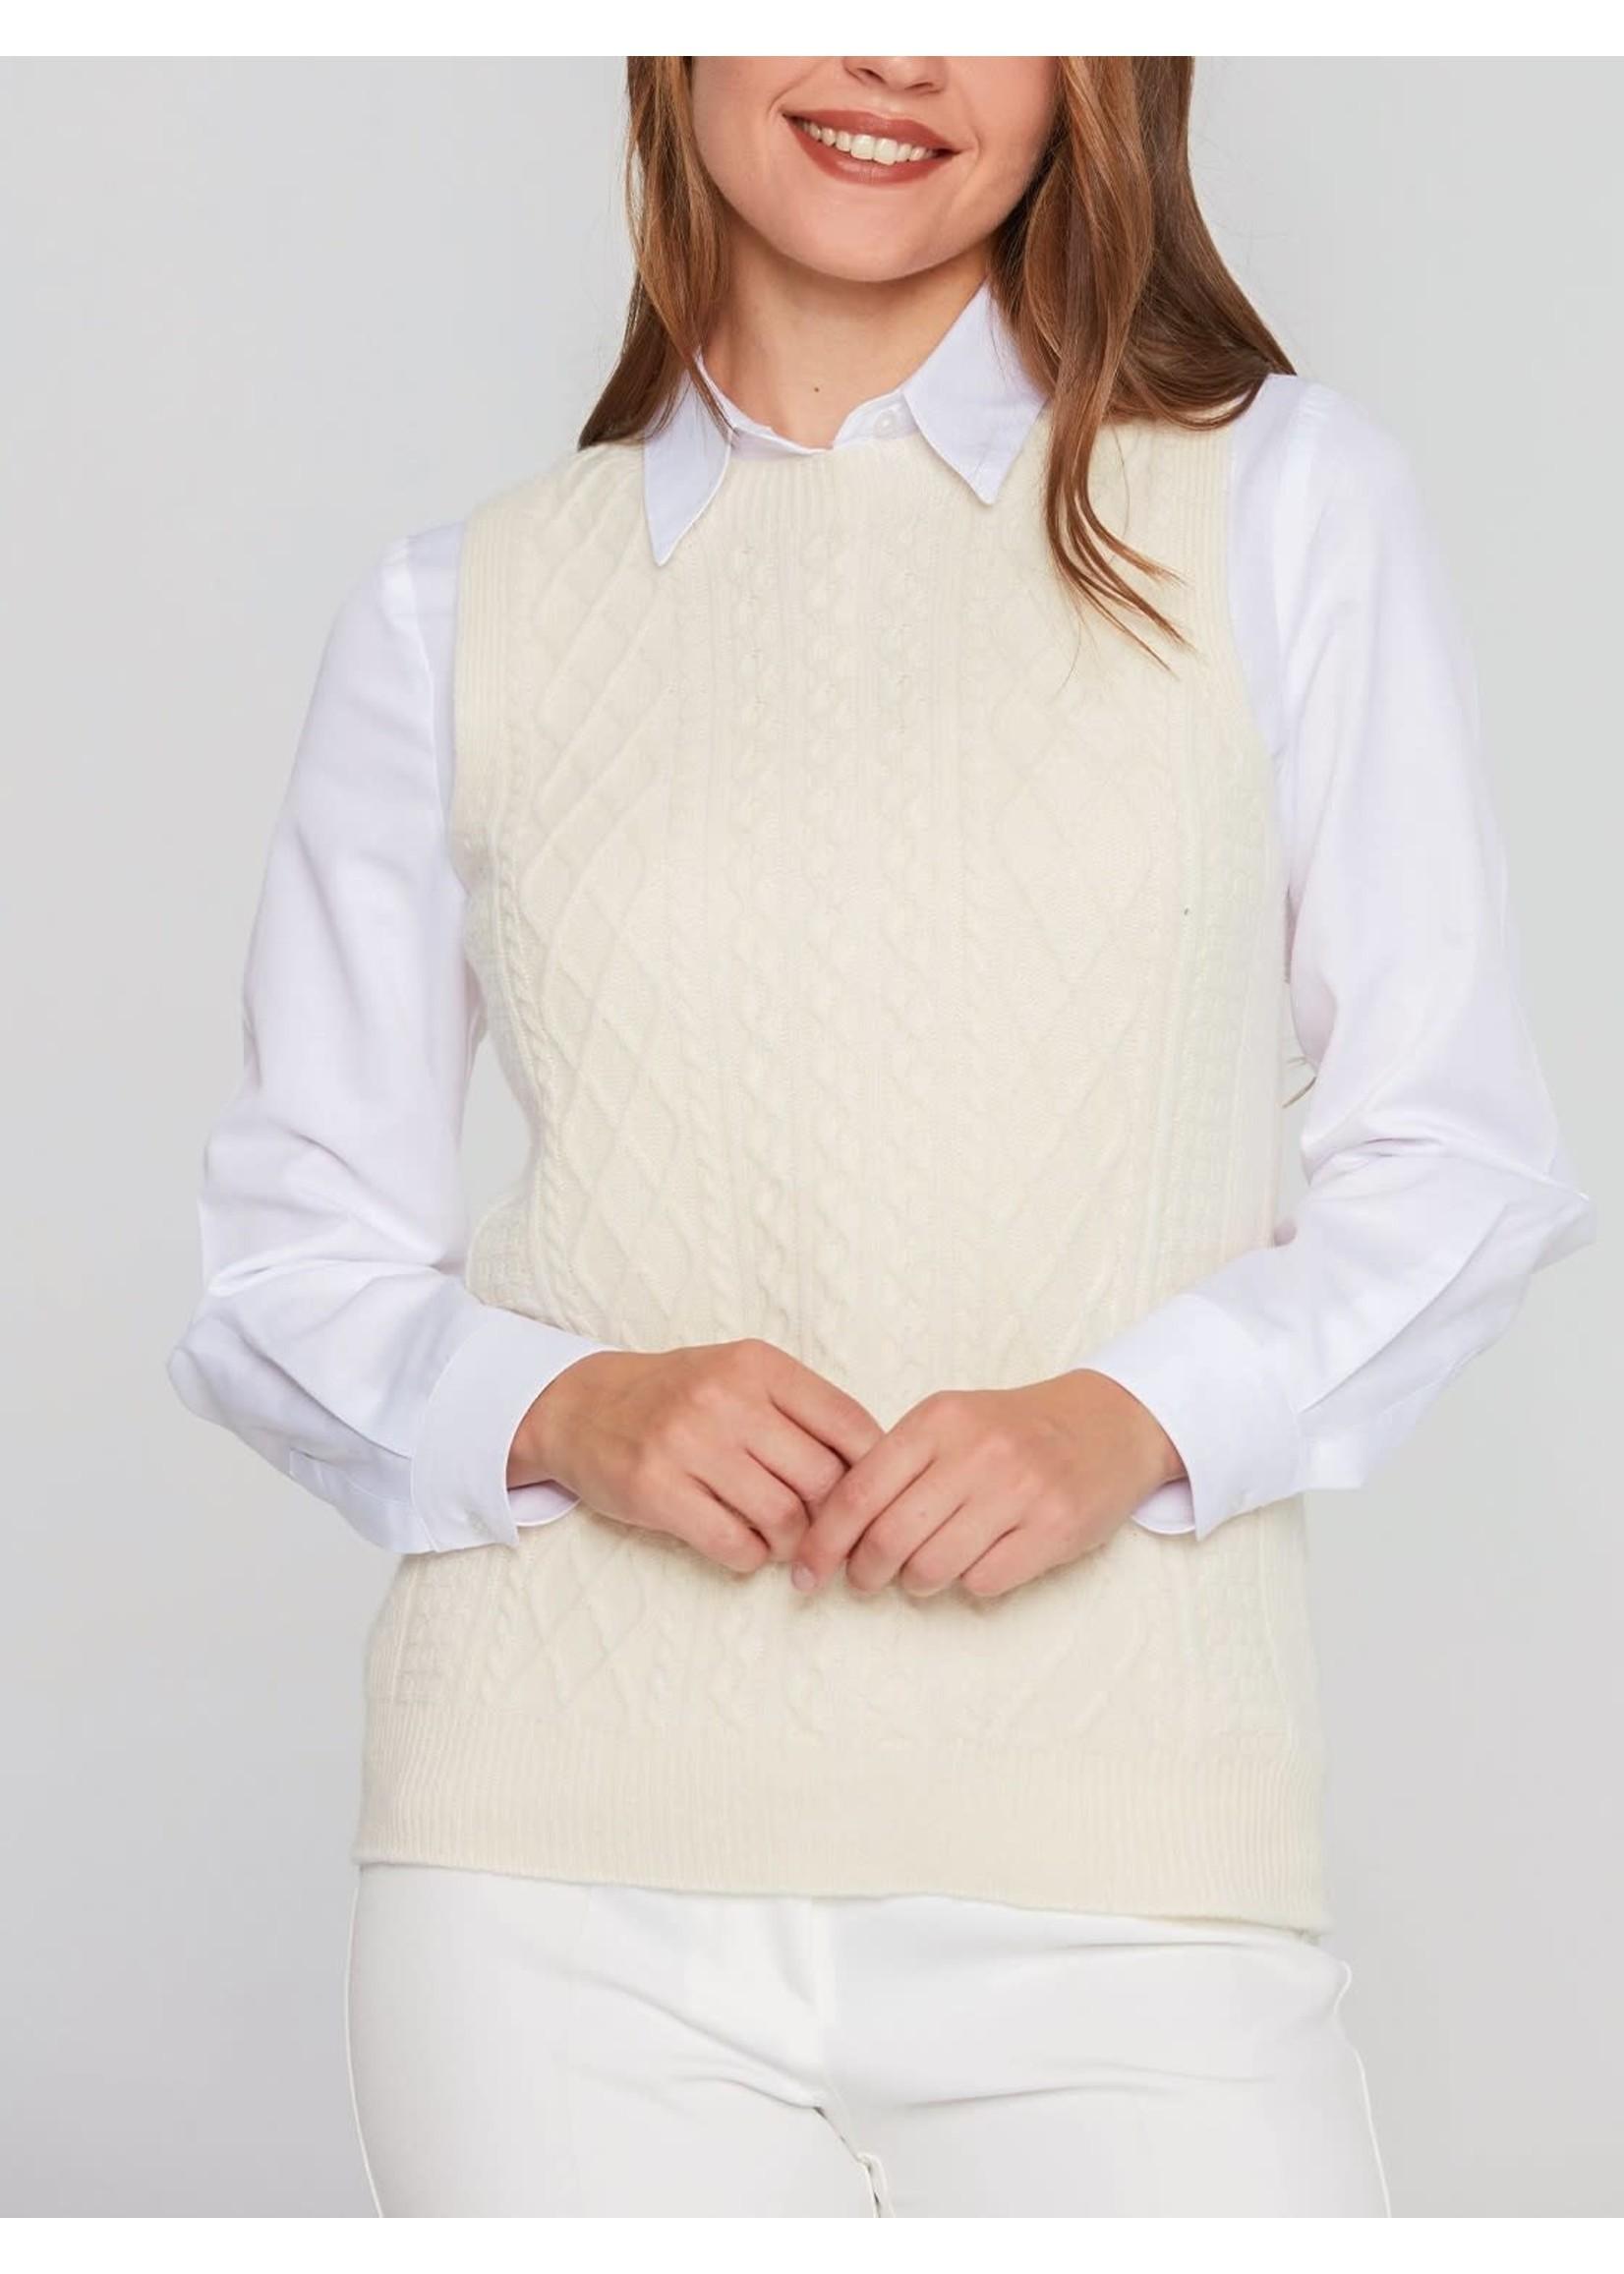 STEPPINOUT 21105 vest